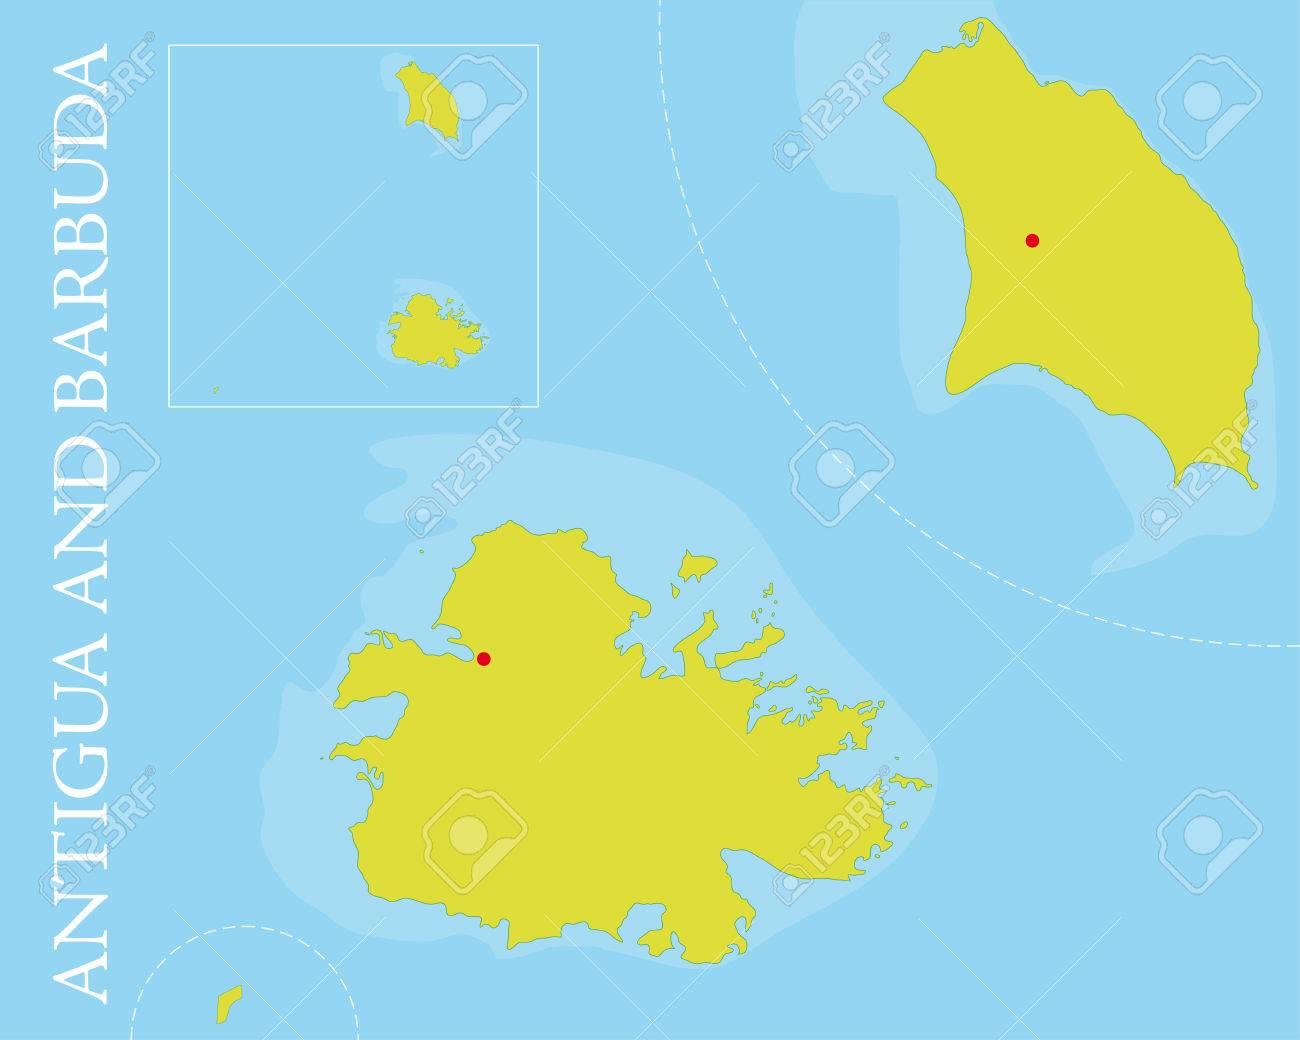 Vector Map Of Antigua And Barbuda Archipelago In The Caribbean - Antigua and barbuda map